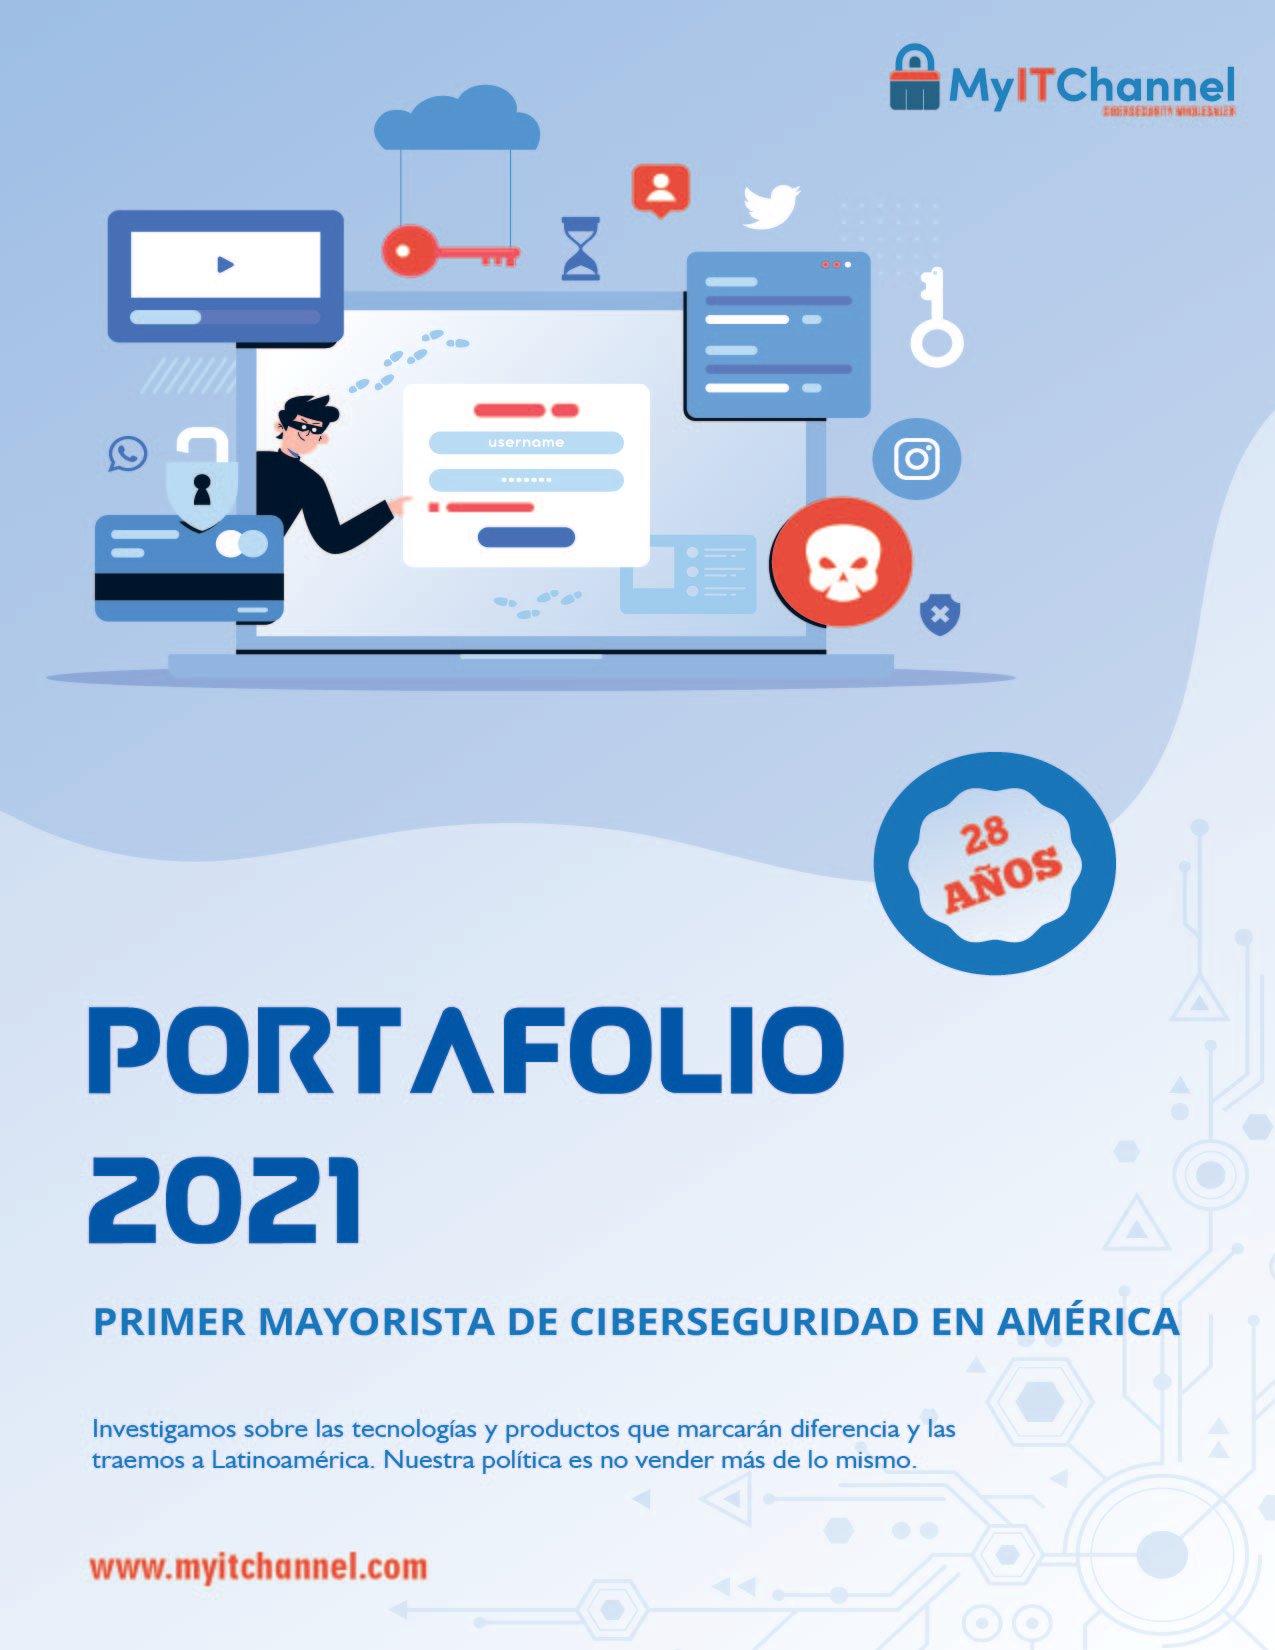 Portafolio-MyITC-1